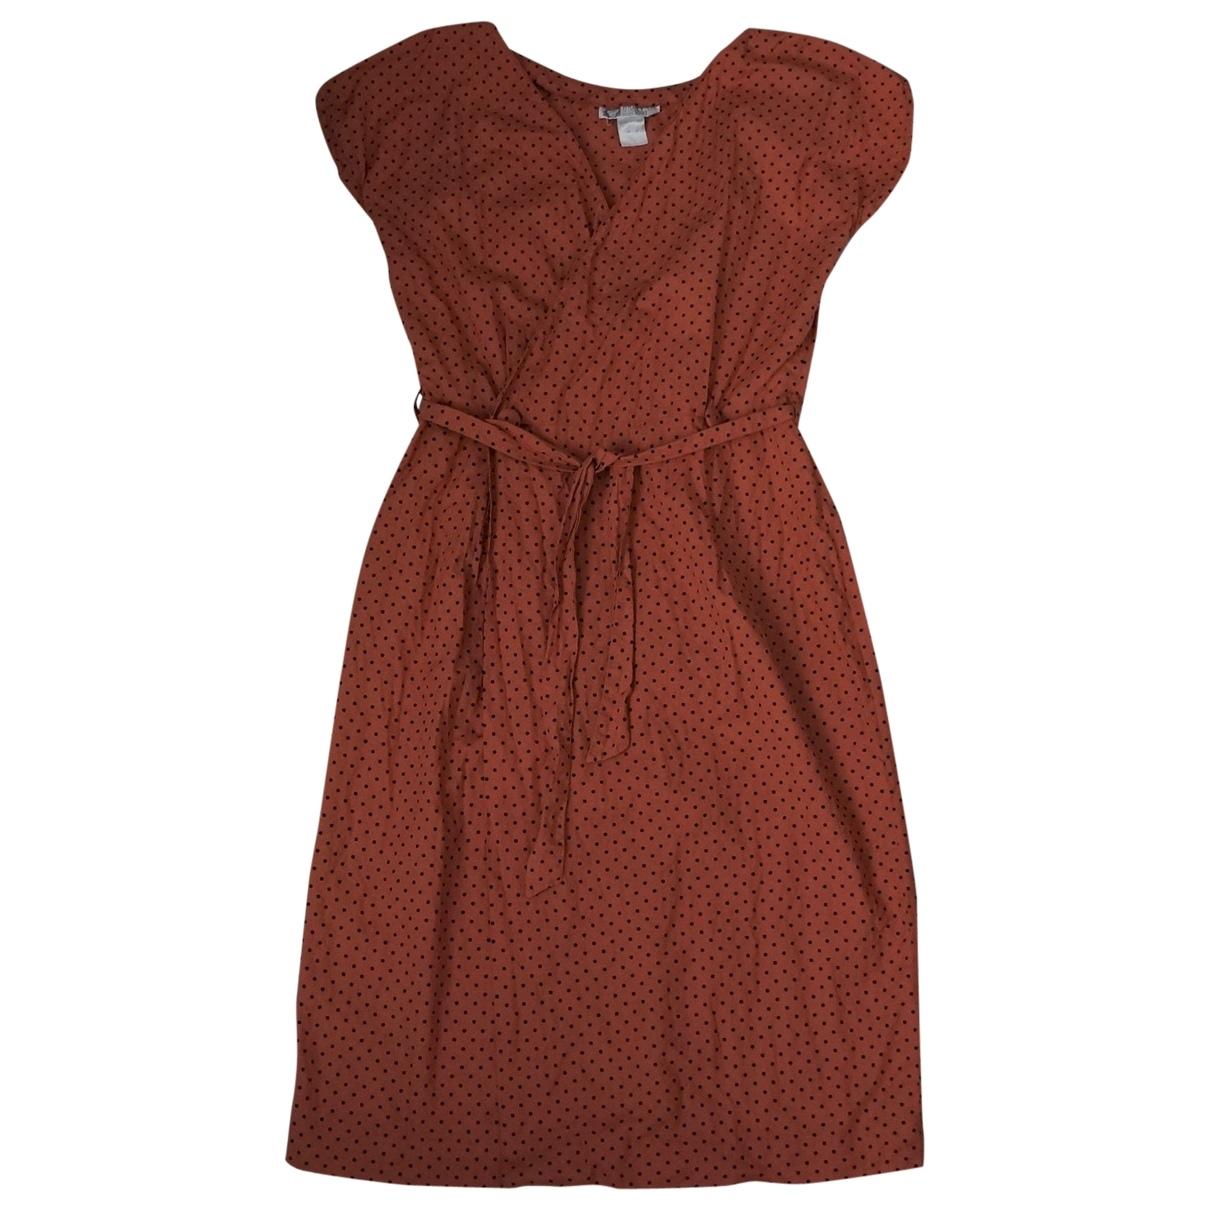 Emmanuelle Khanh \N Cotton dress for Women 44 IT